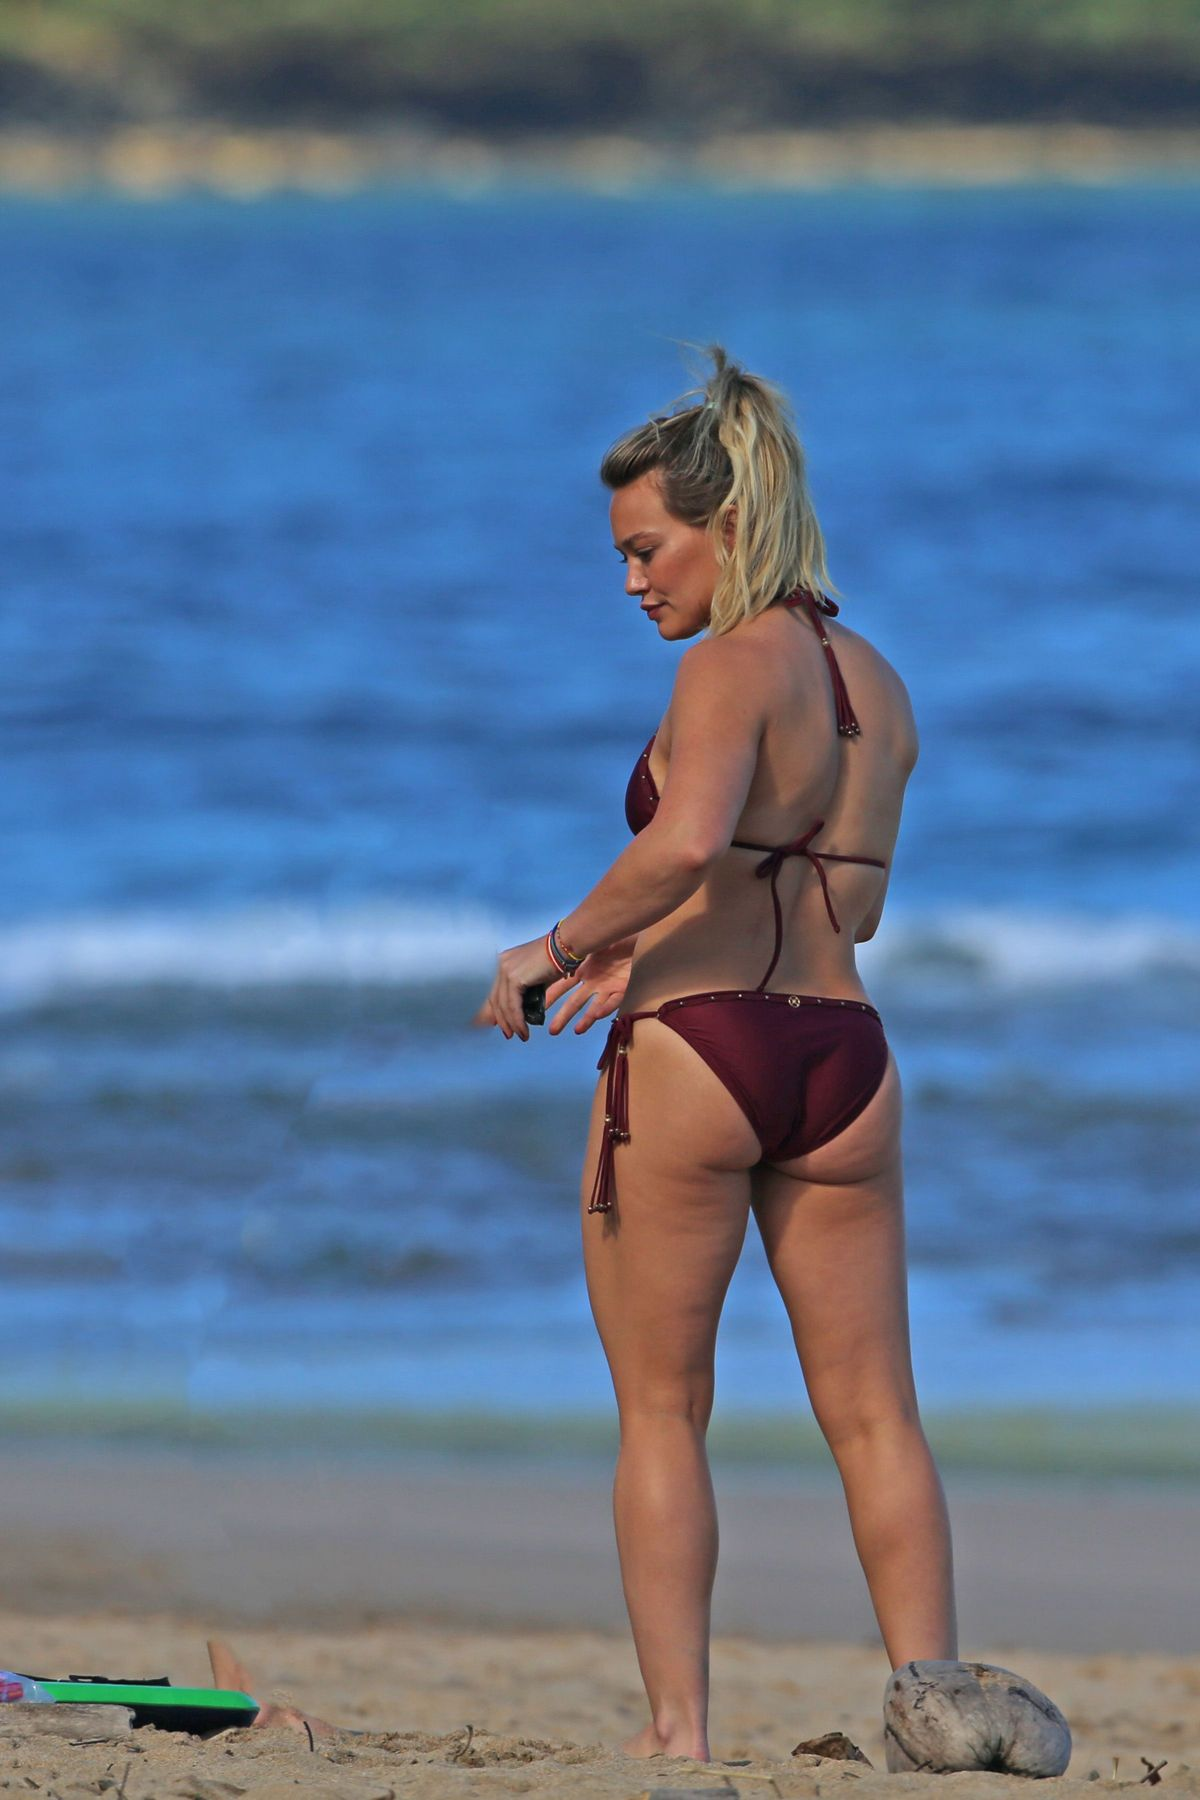 hilary-duff-in-bikini-at-a-beach-in-hawa